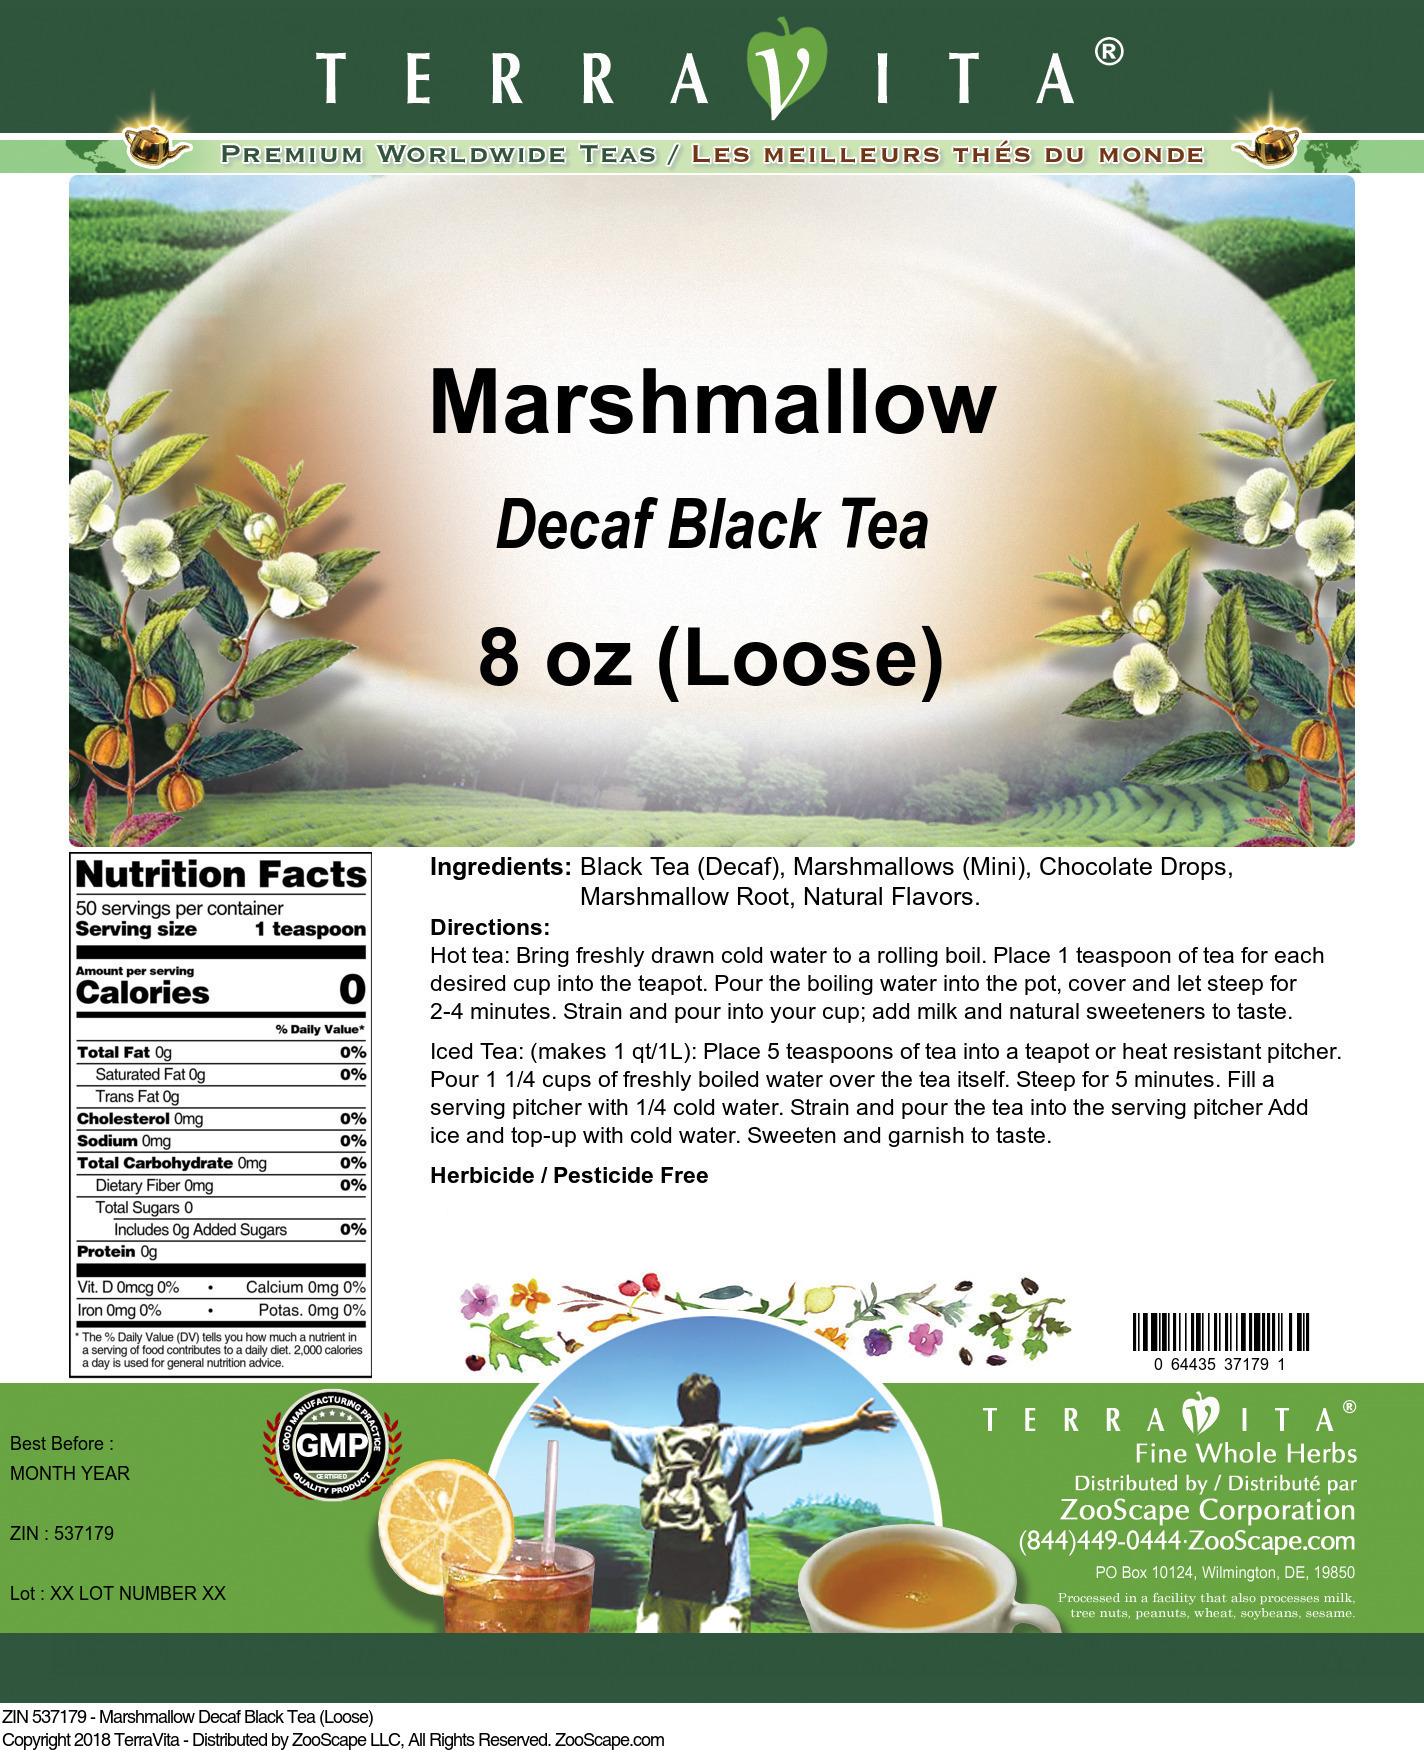 Marshmallow Decaf Black Tea (Loose)